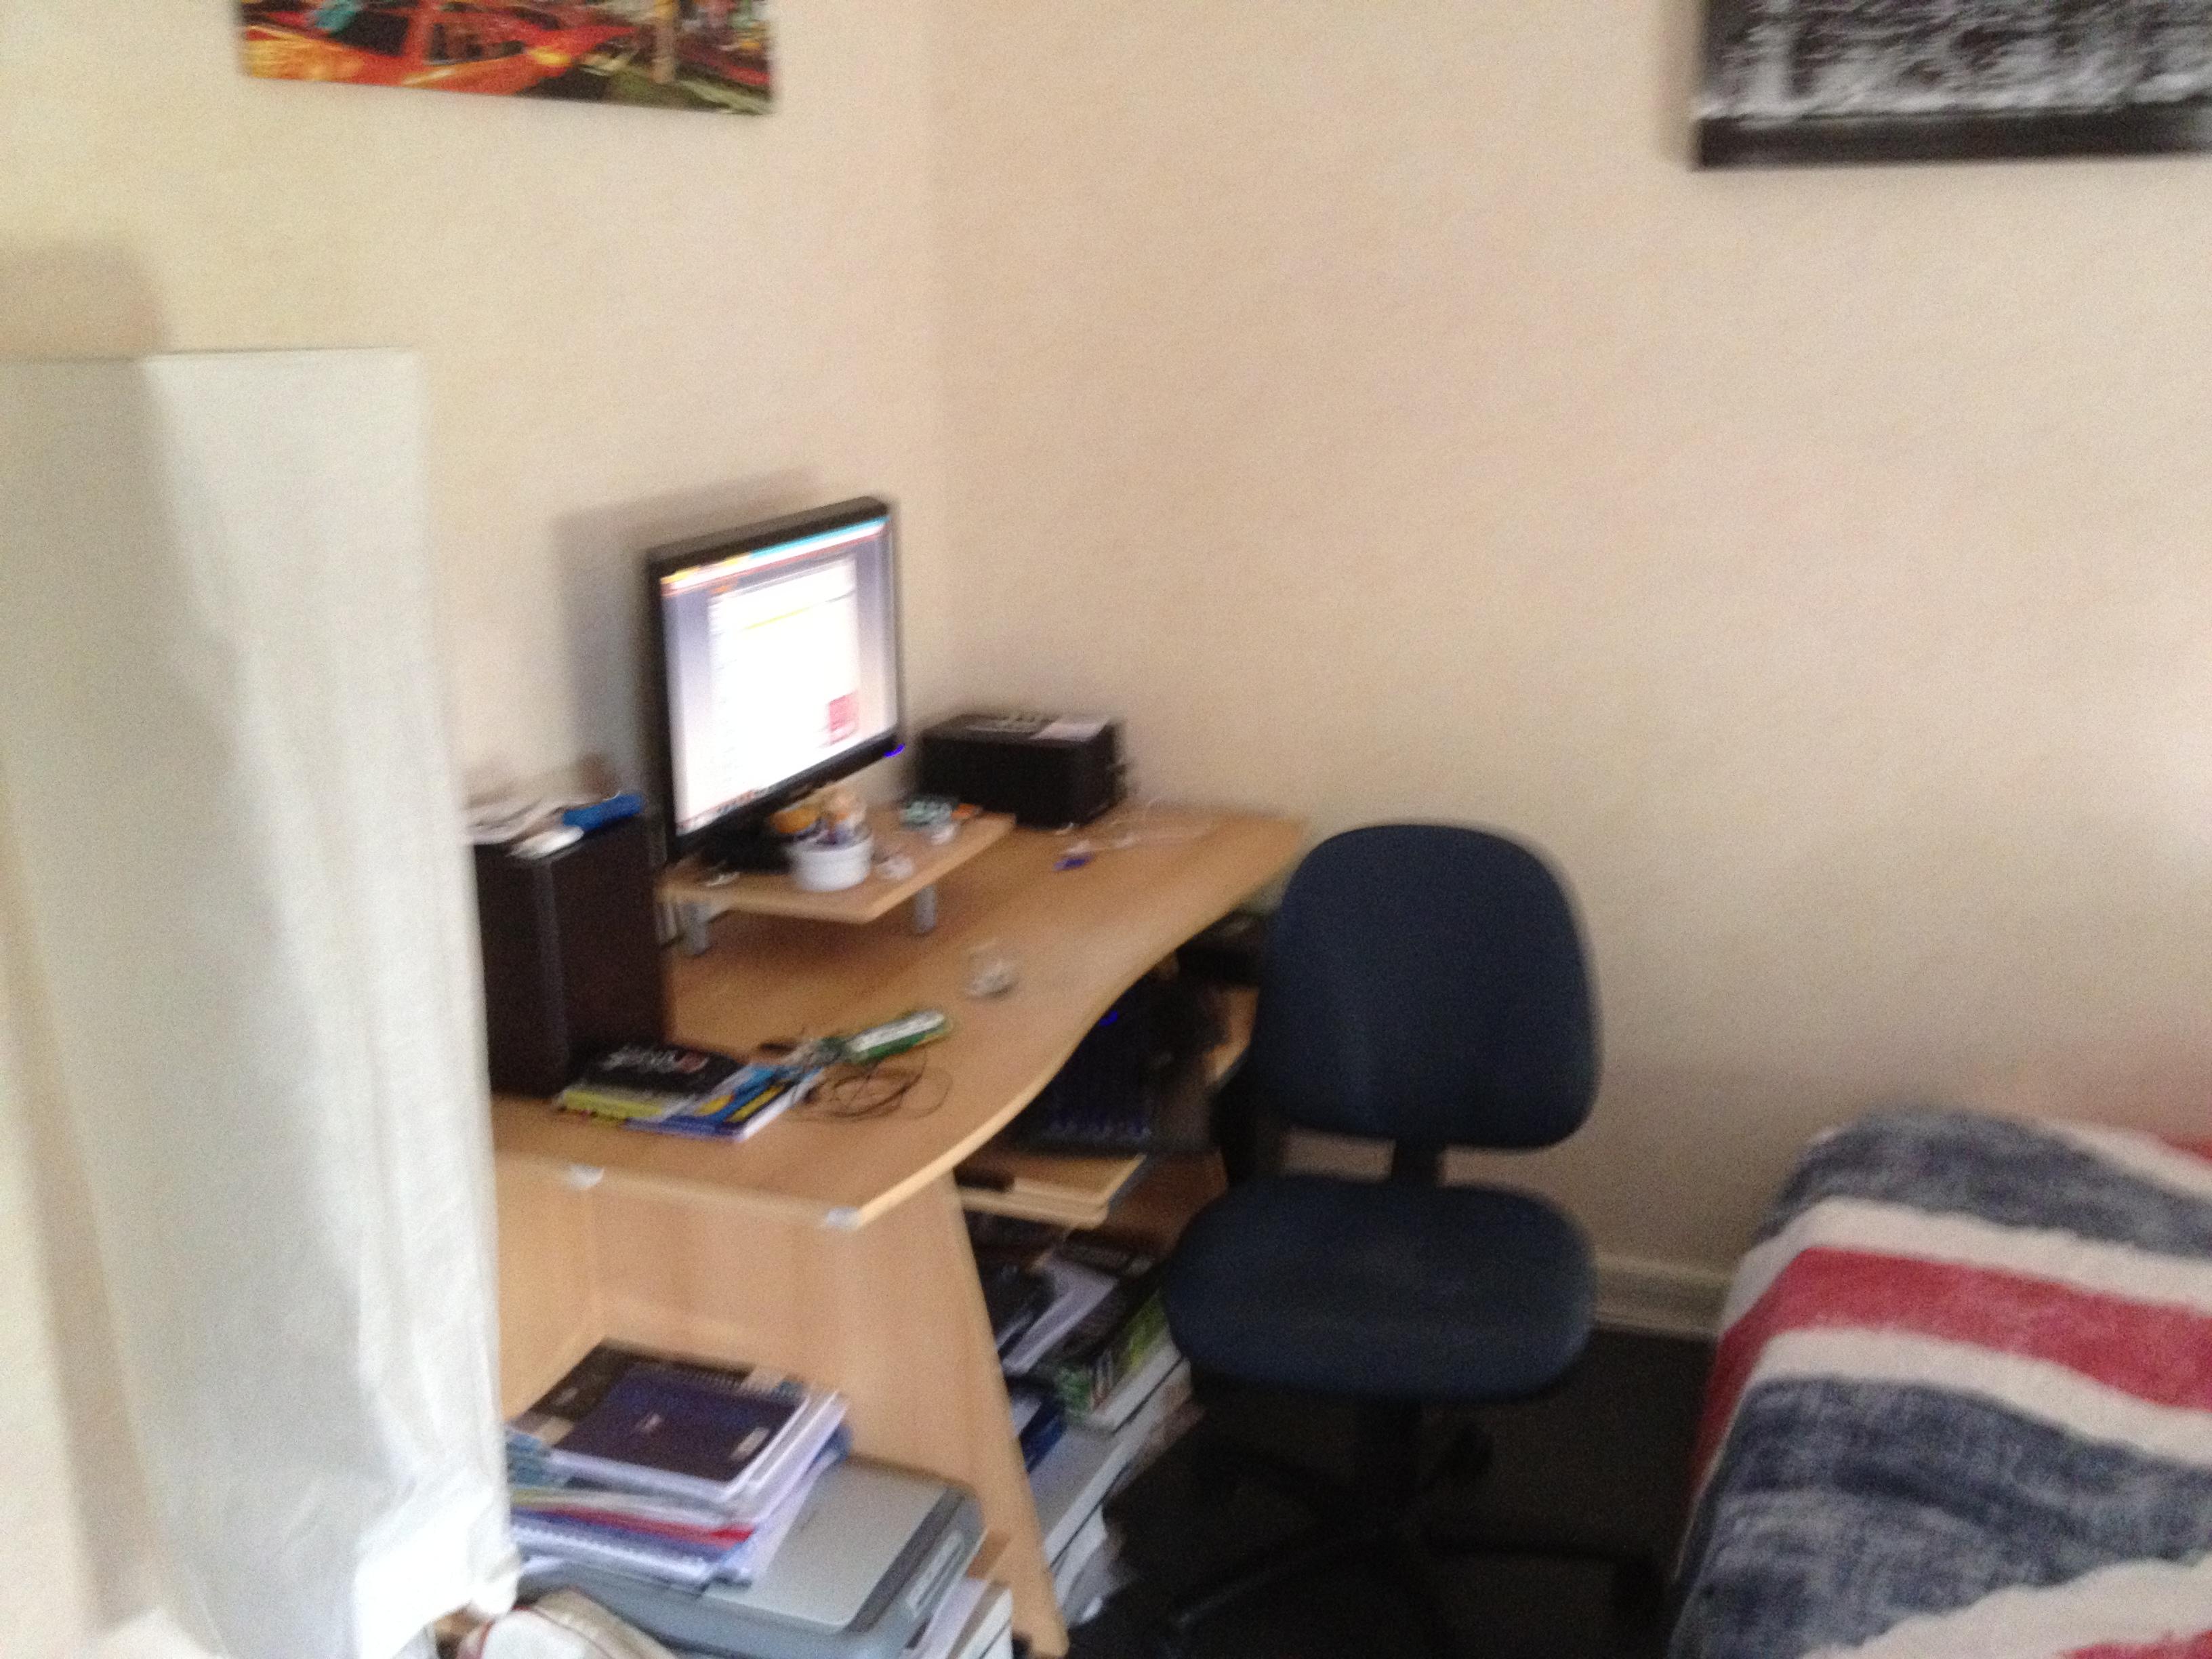 [Photo] Ma chambre en bordel total! sur le forum Blabla 18 ...